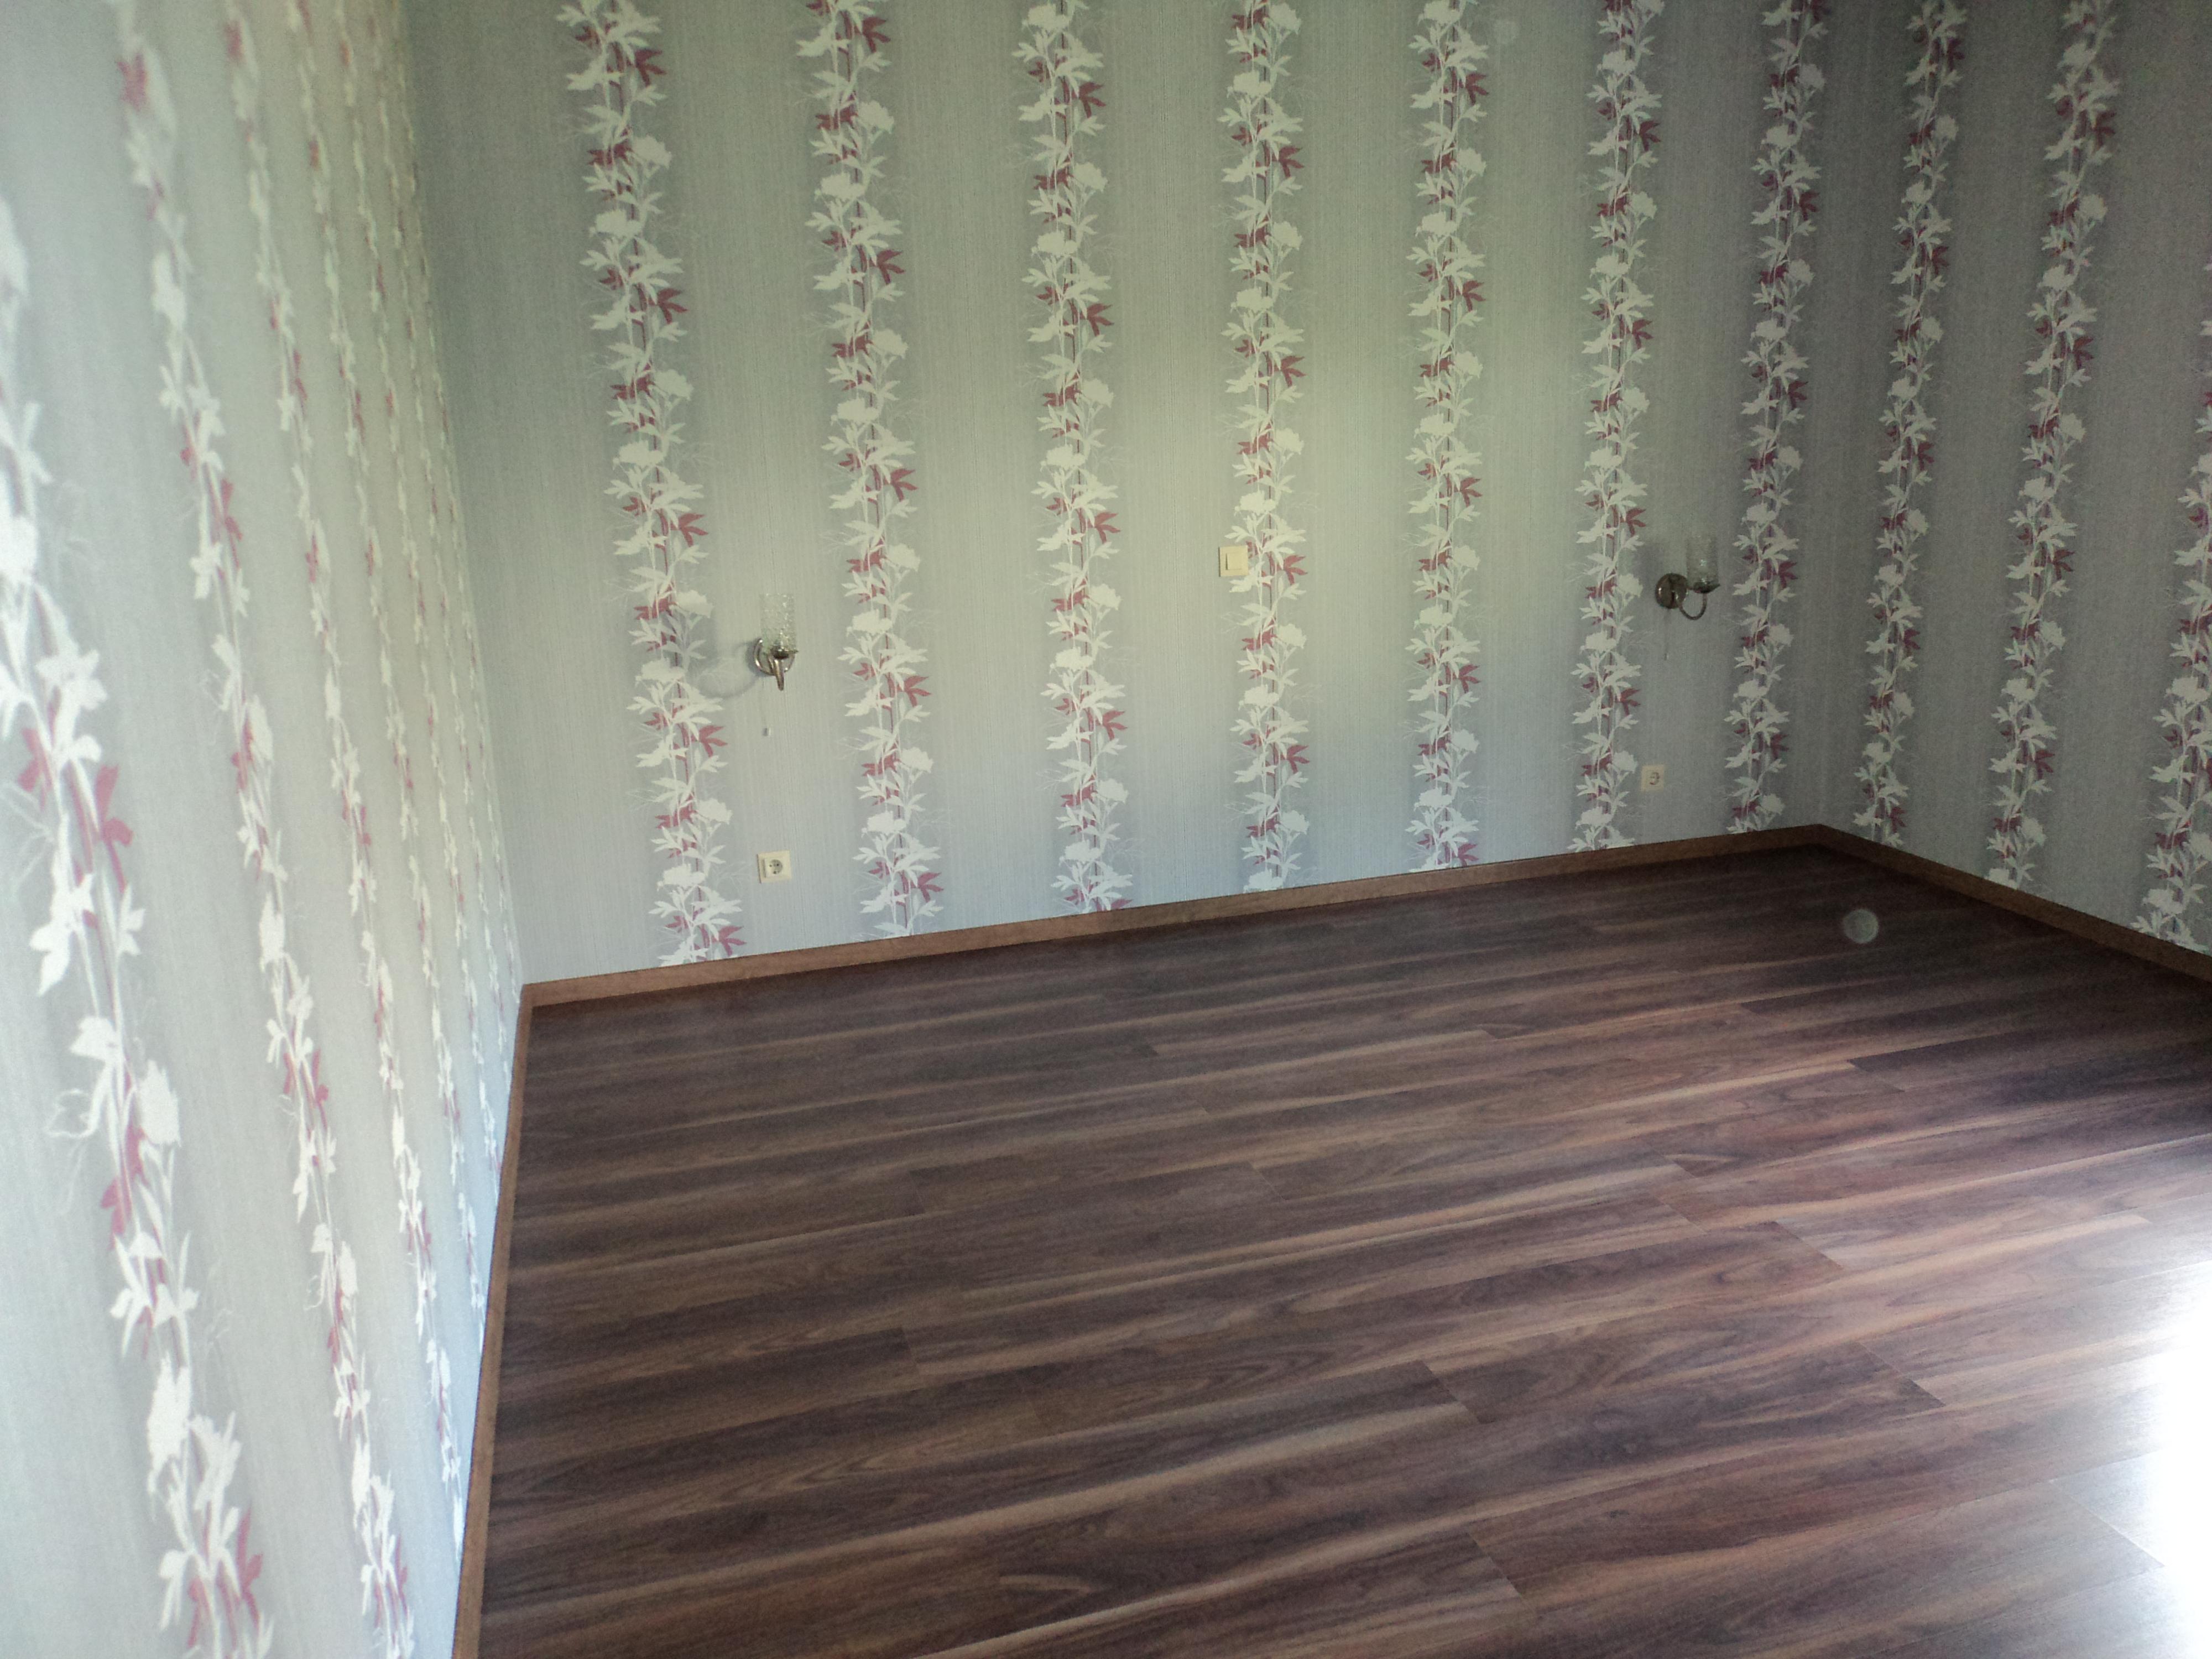 dsc03598 knittel innenausbau. Black Bedroom Furniture Sets. Home Design Ideas